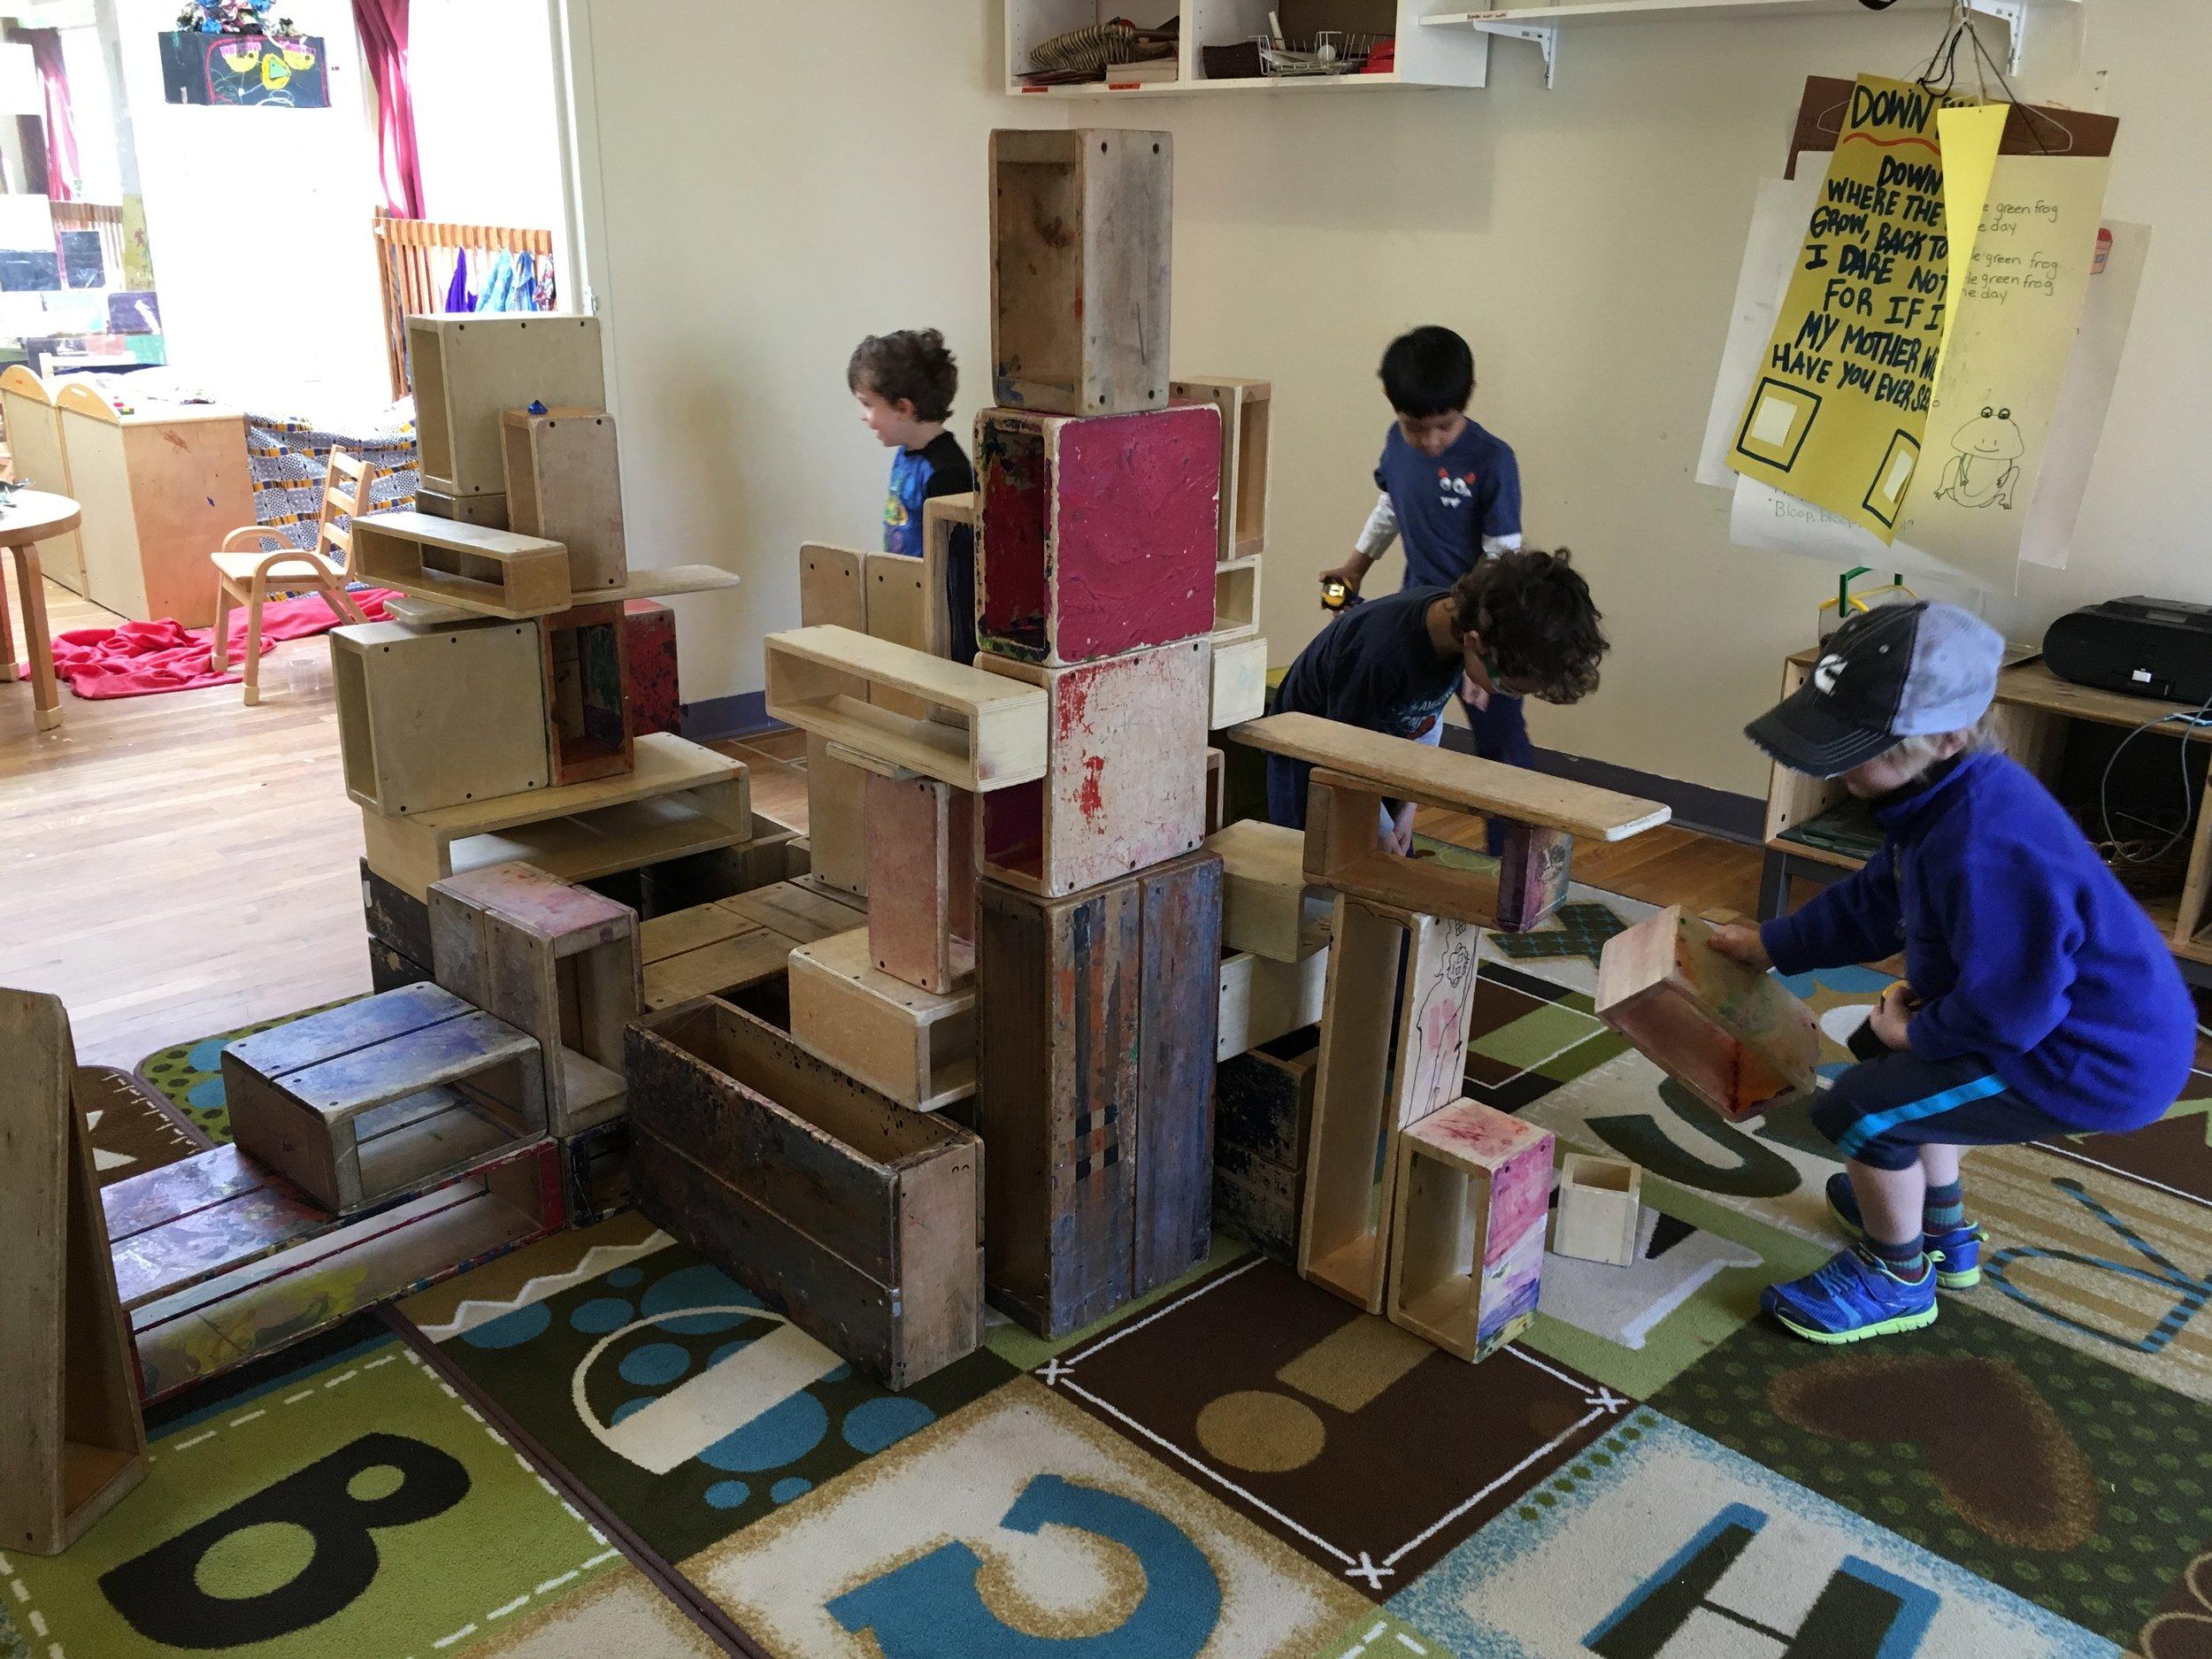 - Constructing with big blocks